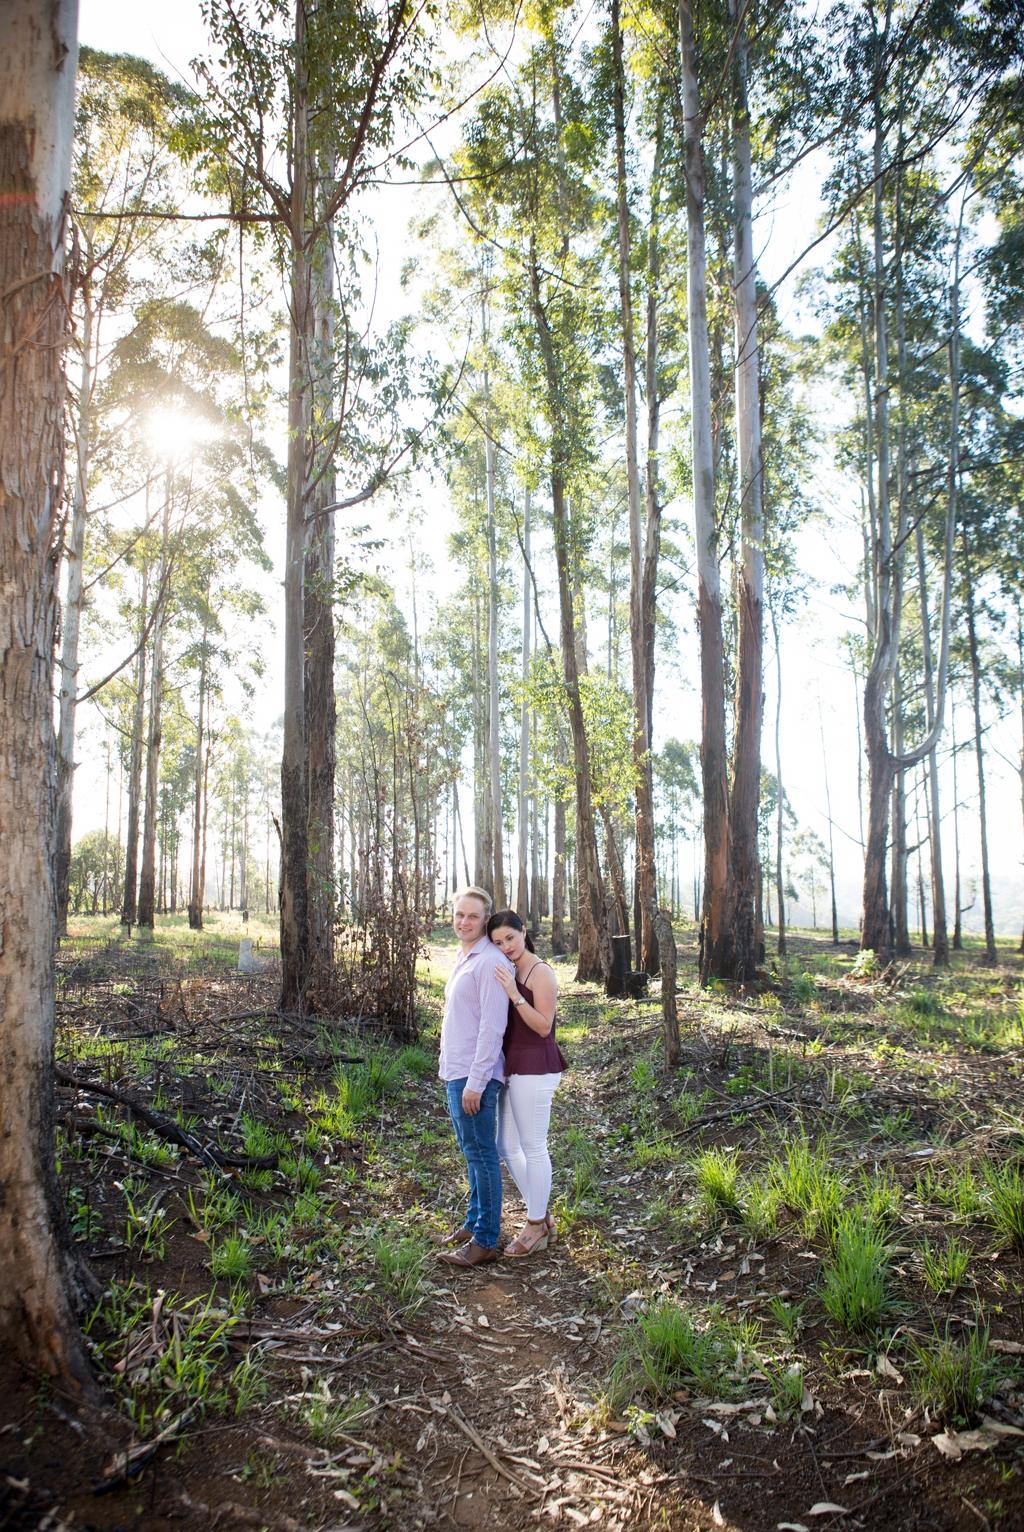 Engagement photographer Hillcrest Durban keri-le and brad engagement shoot Hillcrest Durban